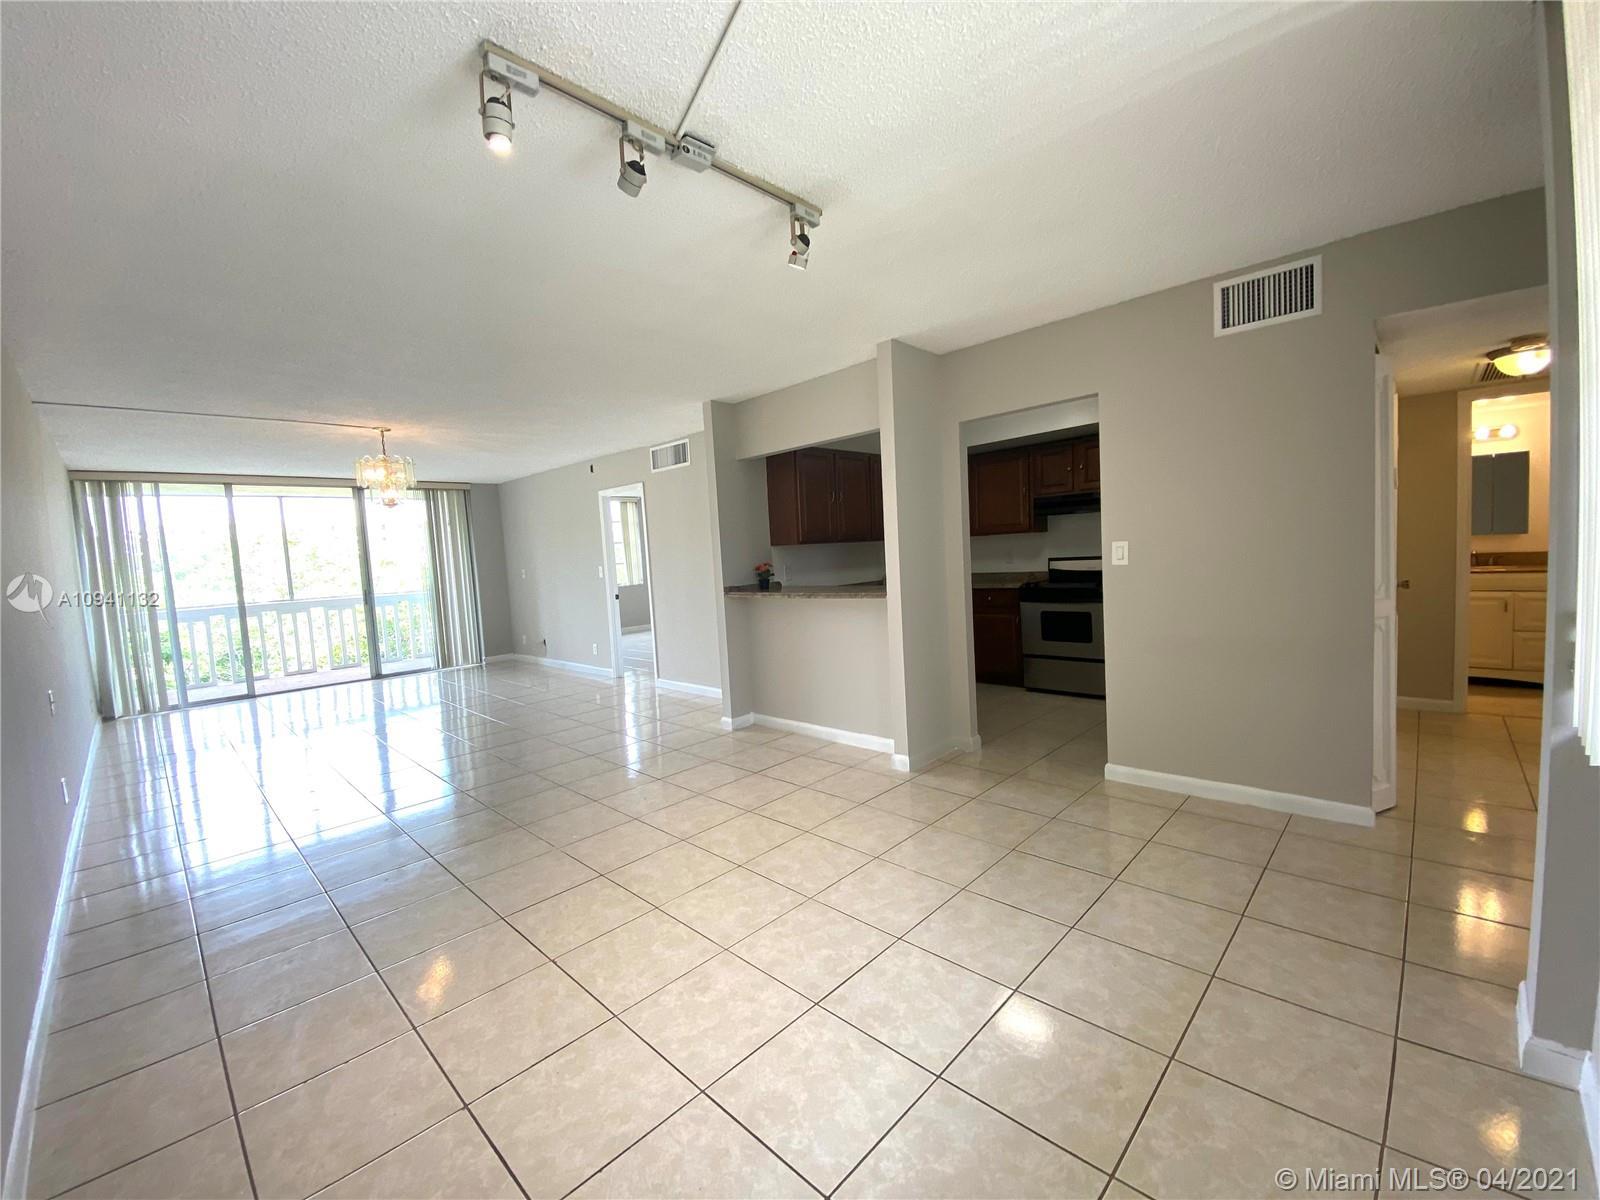 7031 Environ Blvd # 422, Lauderhill, Florida 33319, 2 Bedrooms Bedrooms, ,2 BathroomsBathrooms,Residential,For Sale,7031 Environ Blvd # 422,A10941132